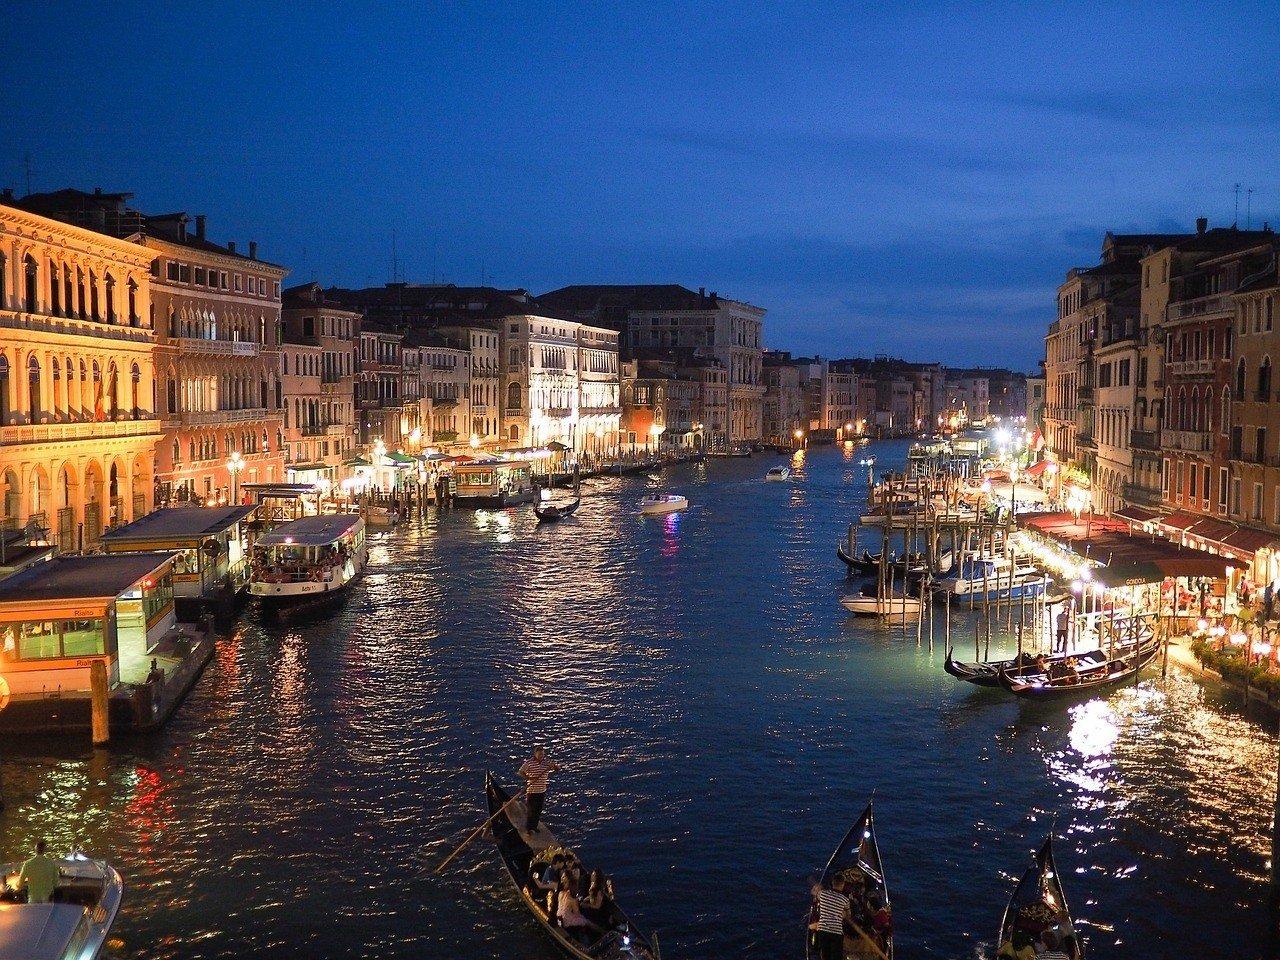 Italy nightlife